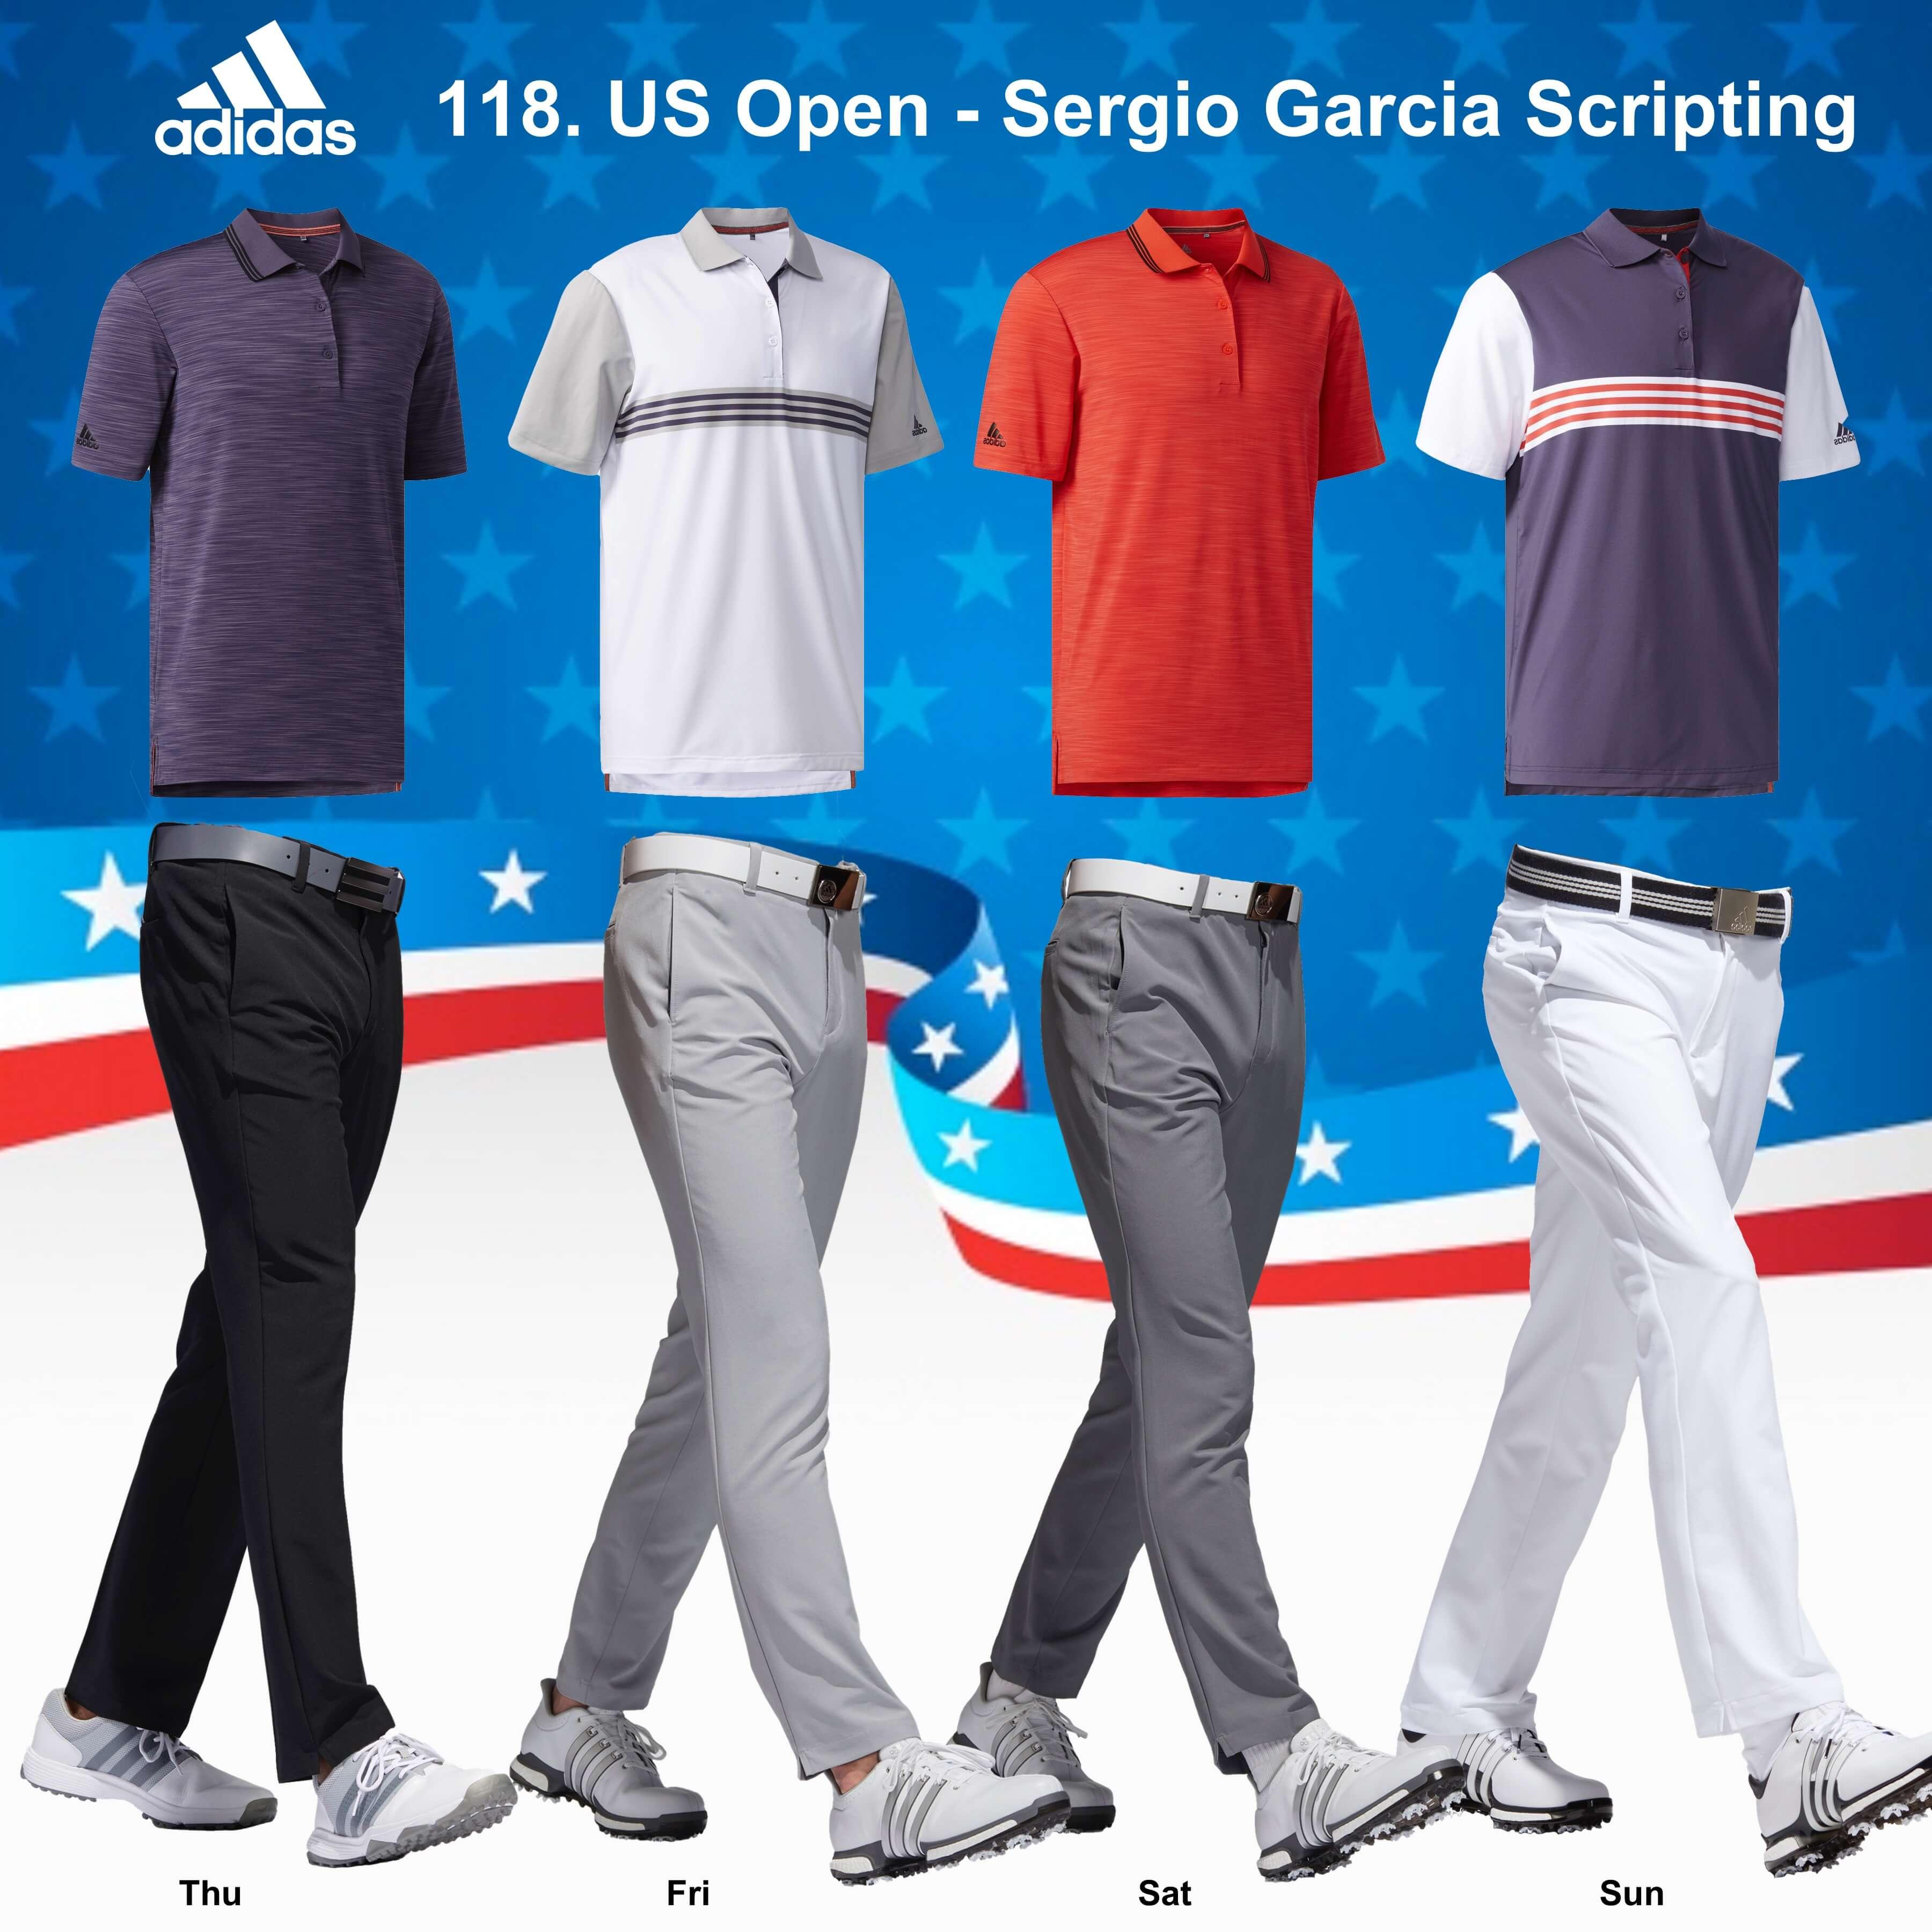 Sergio Garcia 118. US Open Scripting